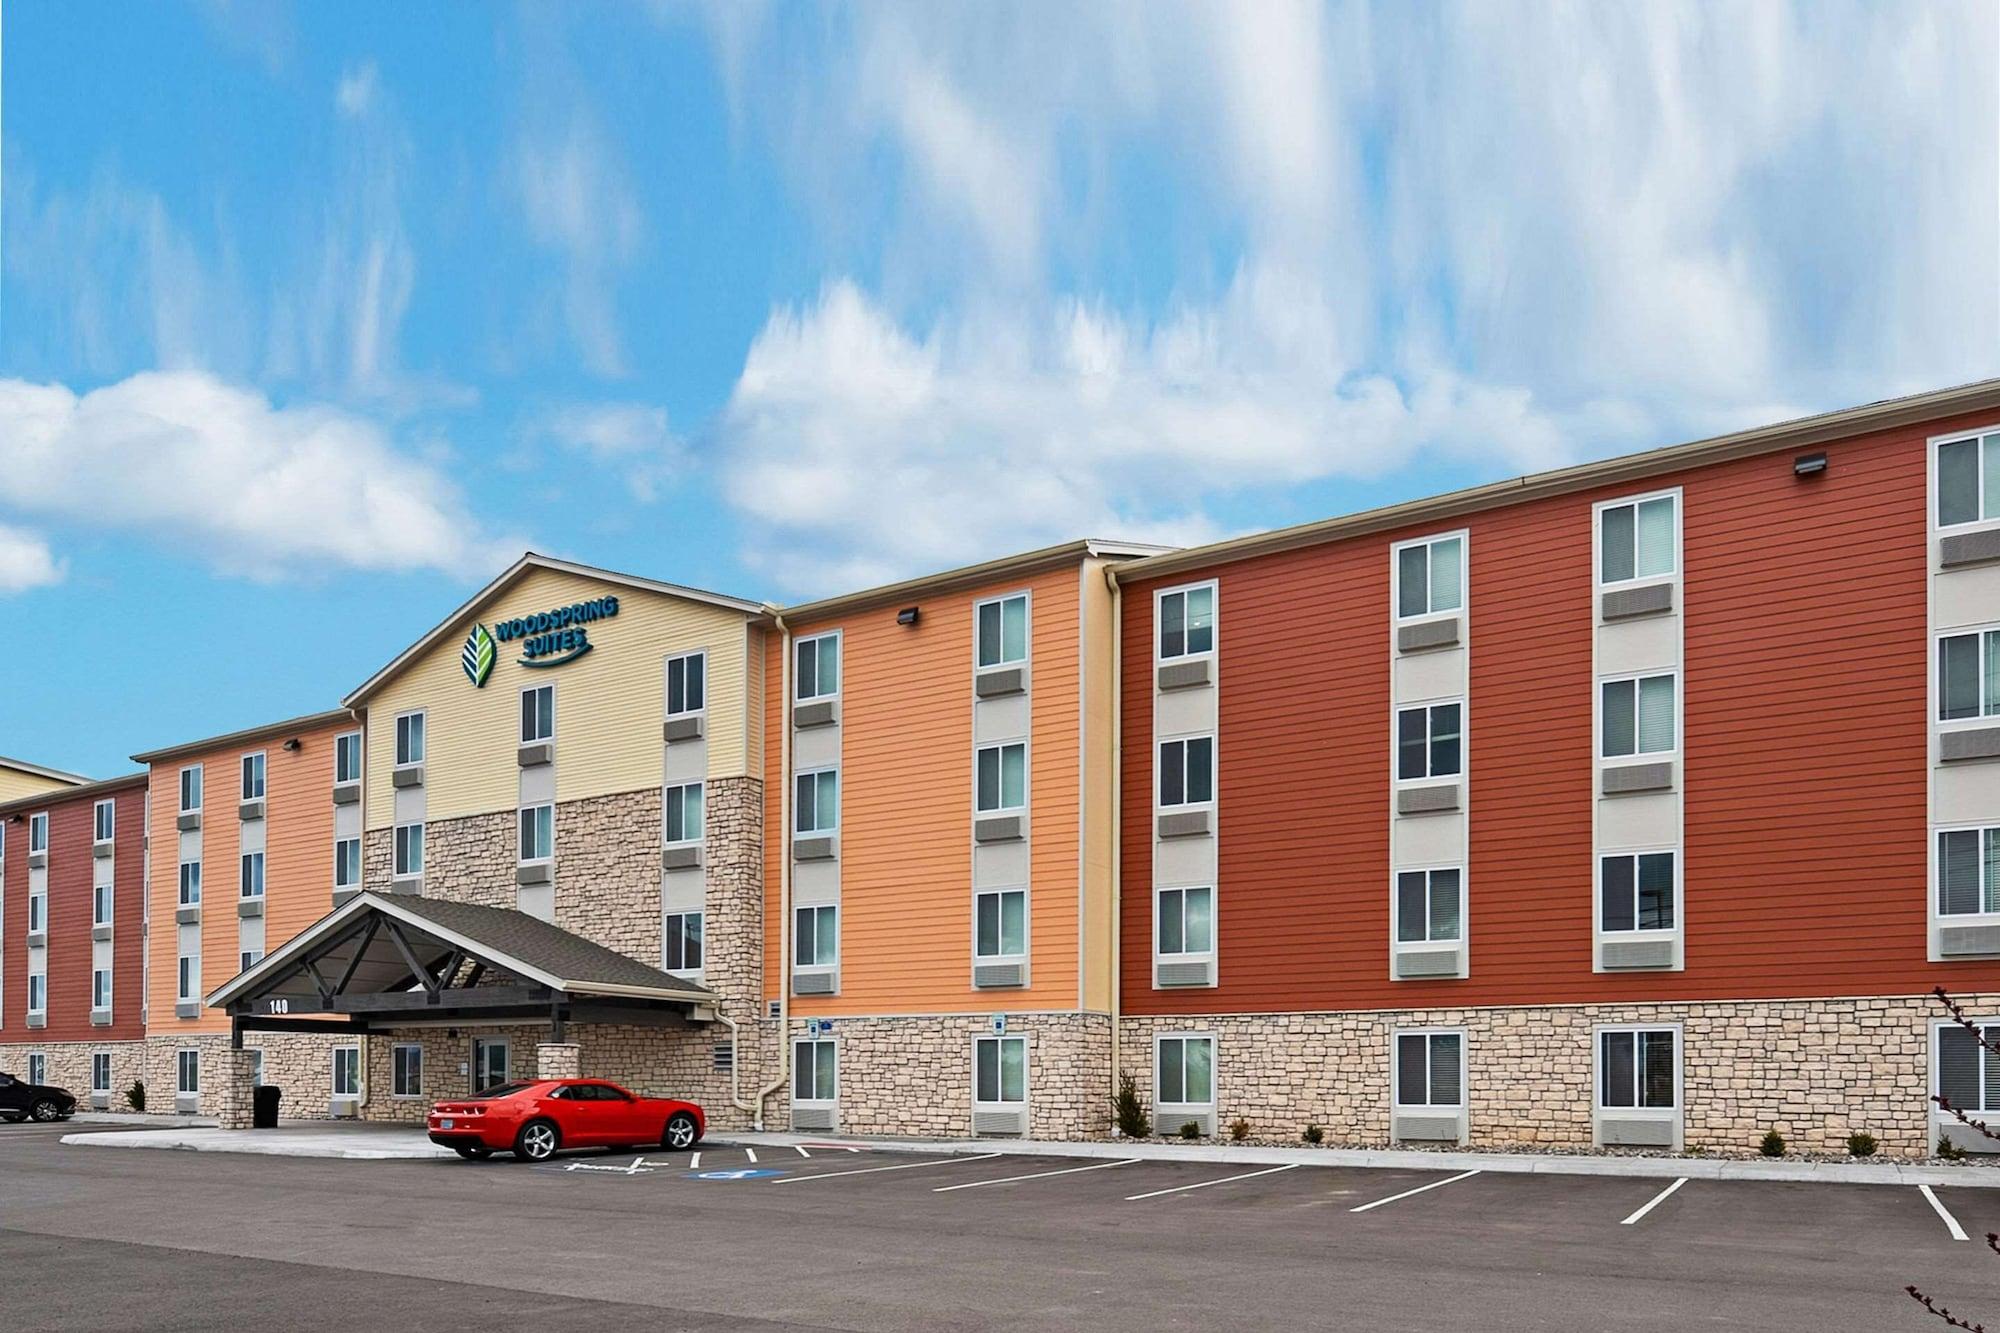 WoodSpring Suites Reno Sparks, Washoe